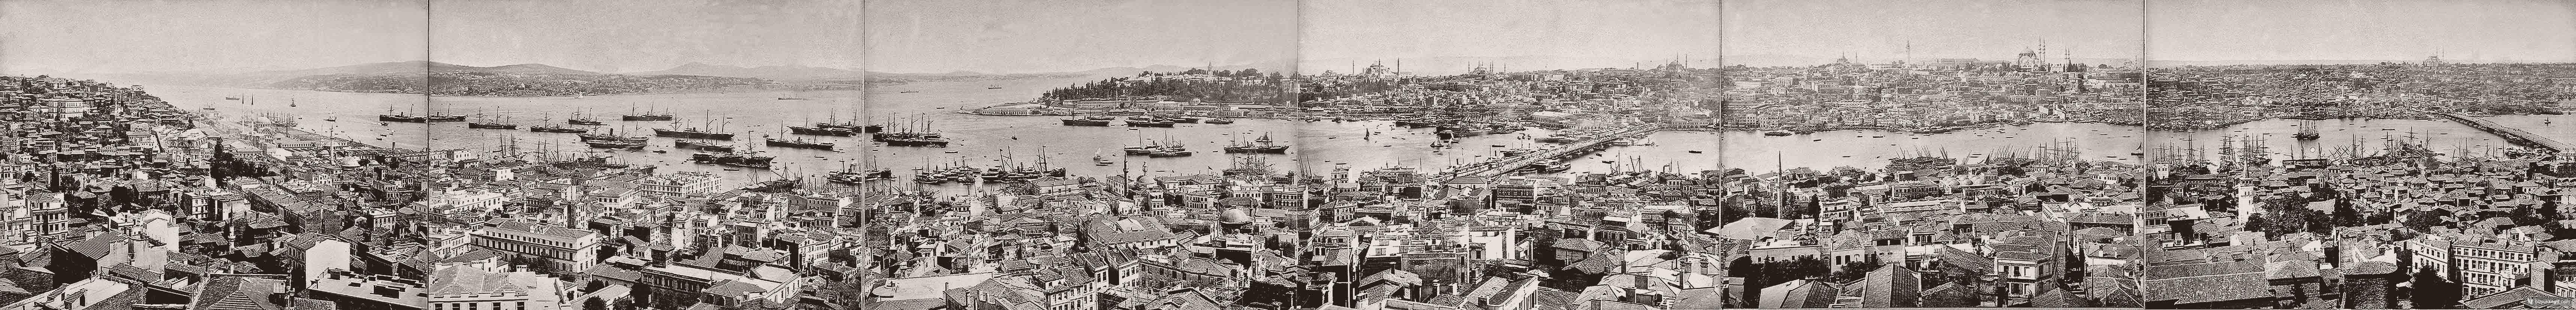 ISTANBUL-Panorama1